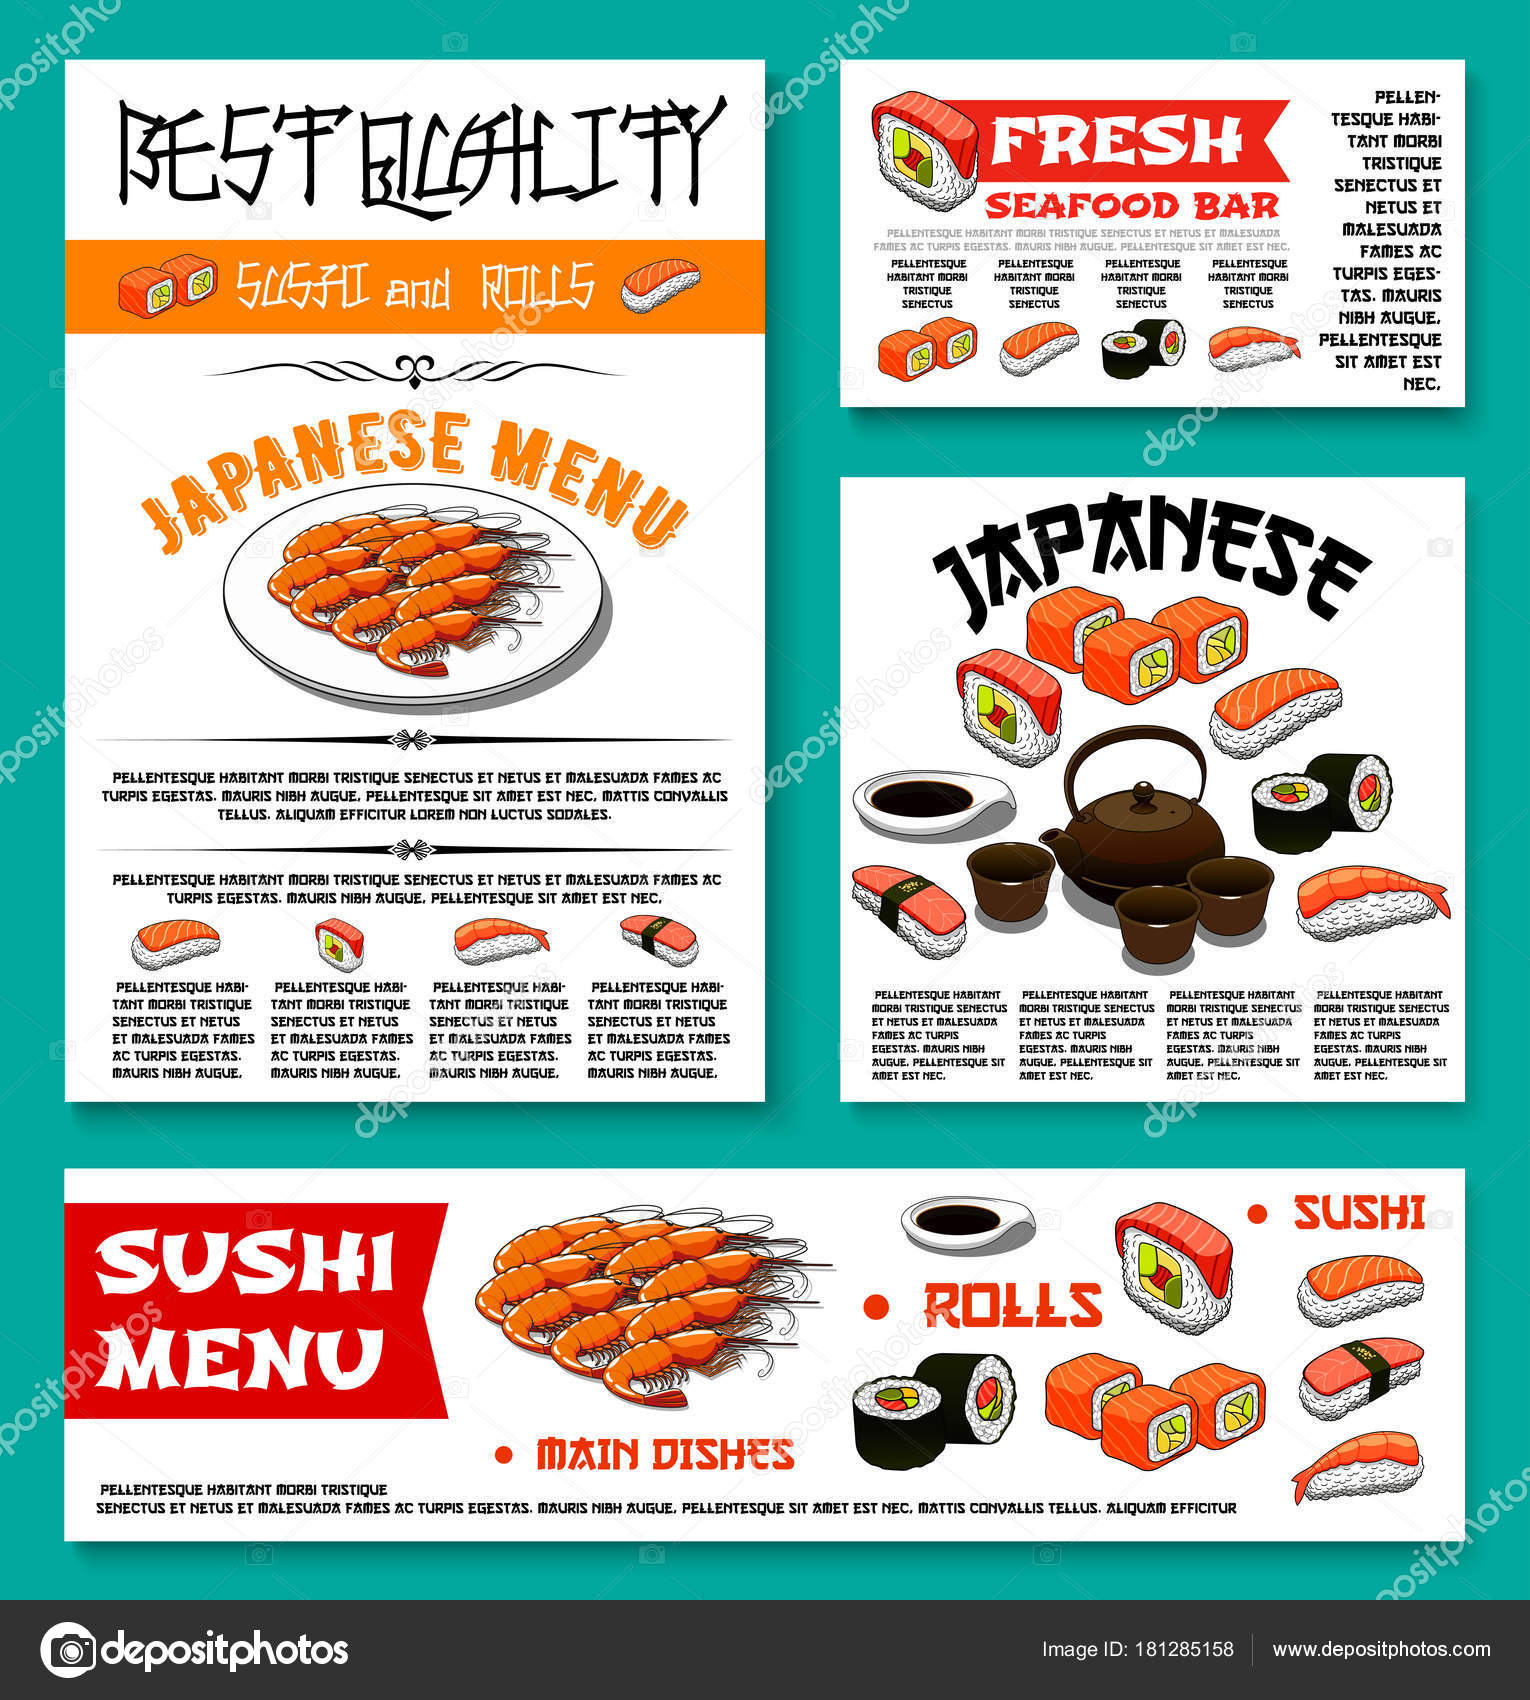 Japanisches Restaurant Sushi-Menü-Vektor-Vorlagen — Stockvektor ...